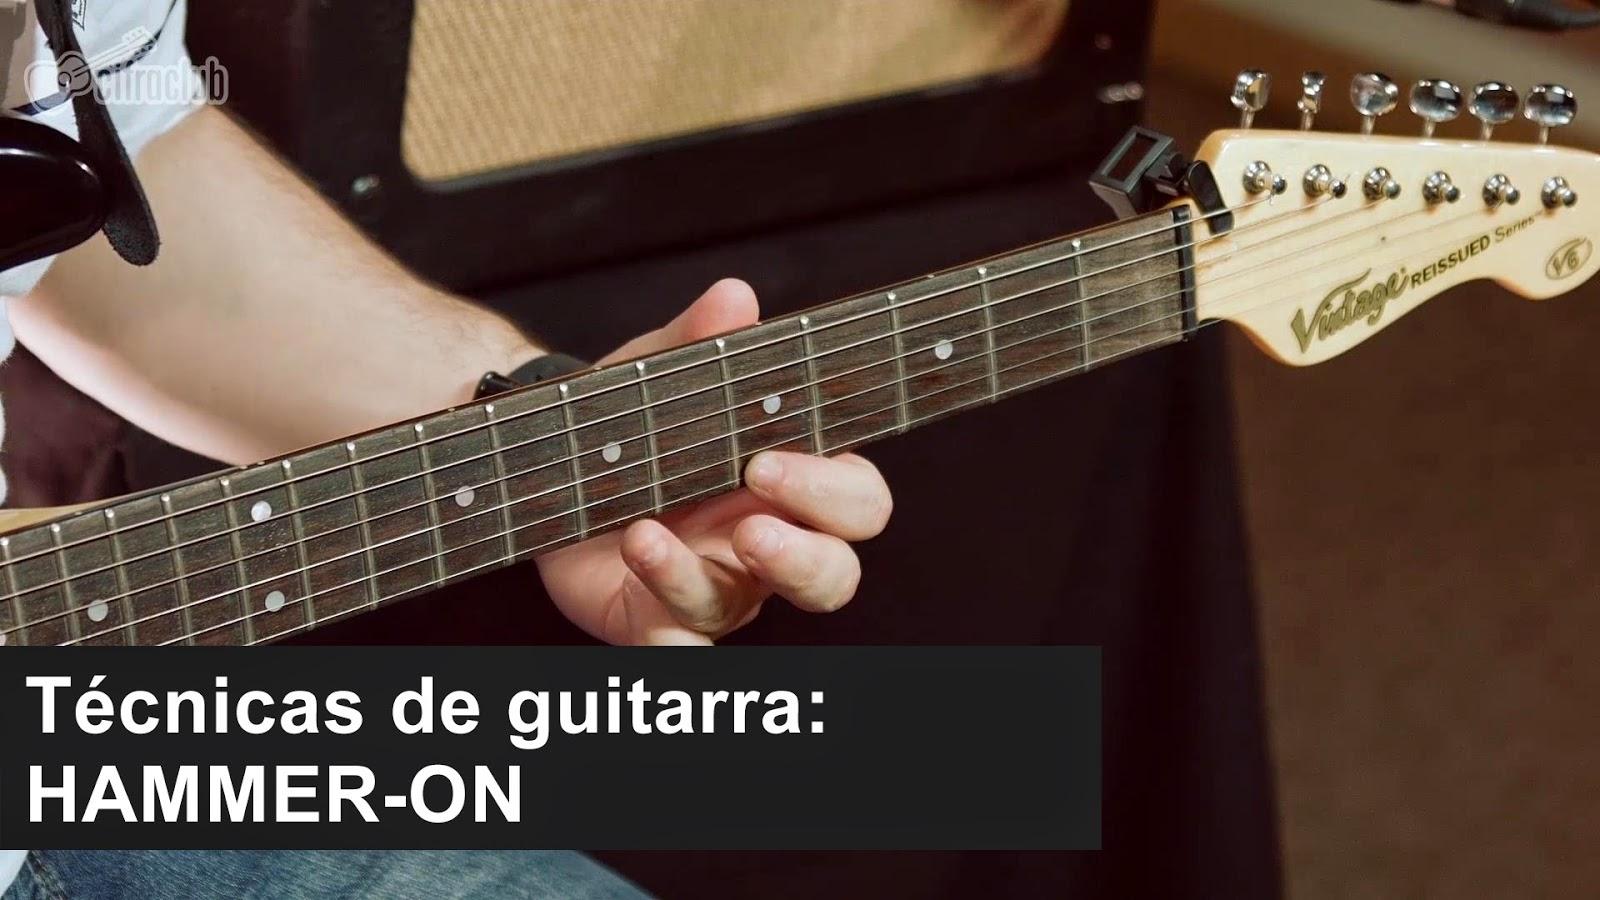 http://questoeseargumentos.blogspot.com.br/2014/10/tecnicas-de-guitarra-hammer-on-aula.html